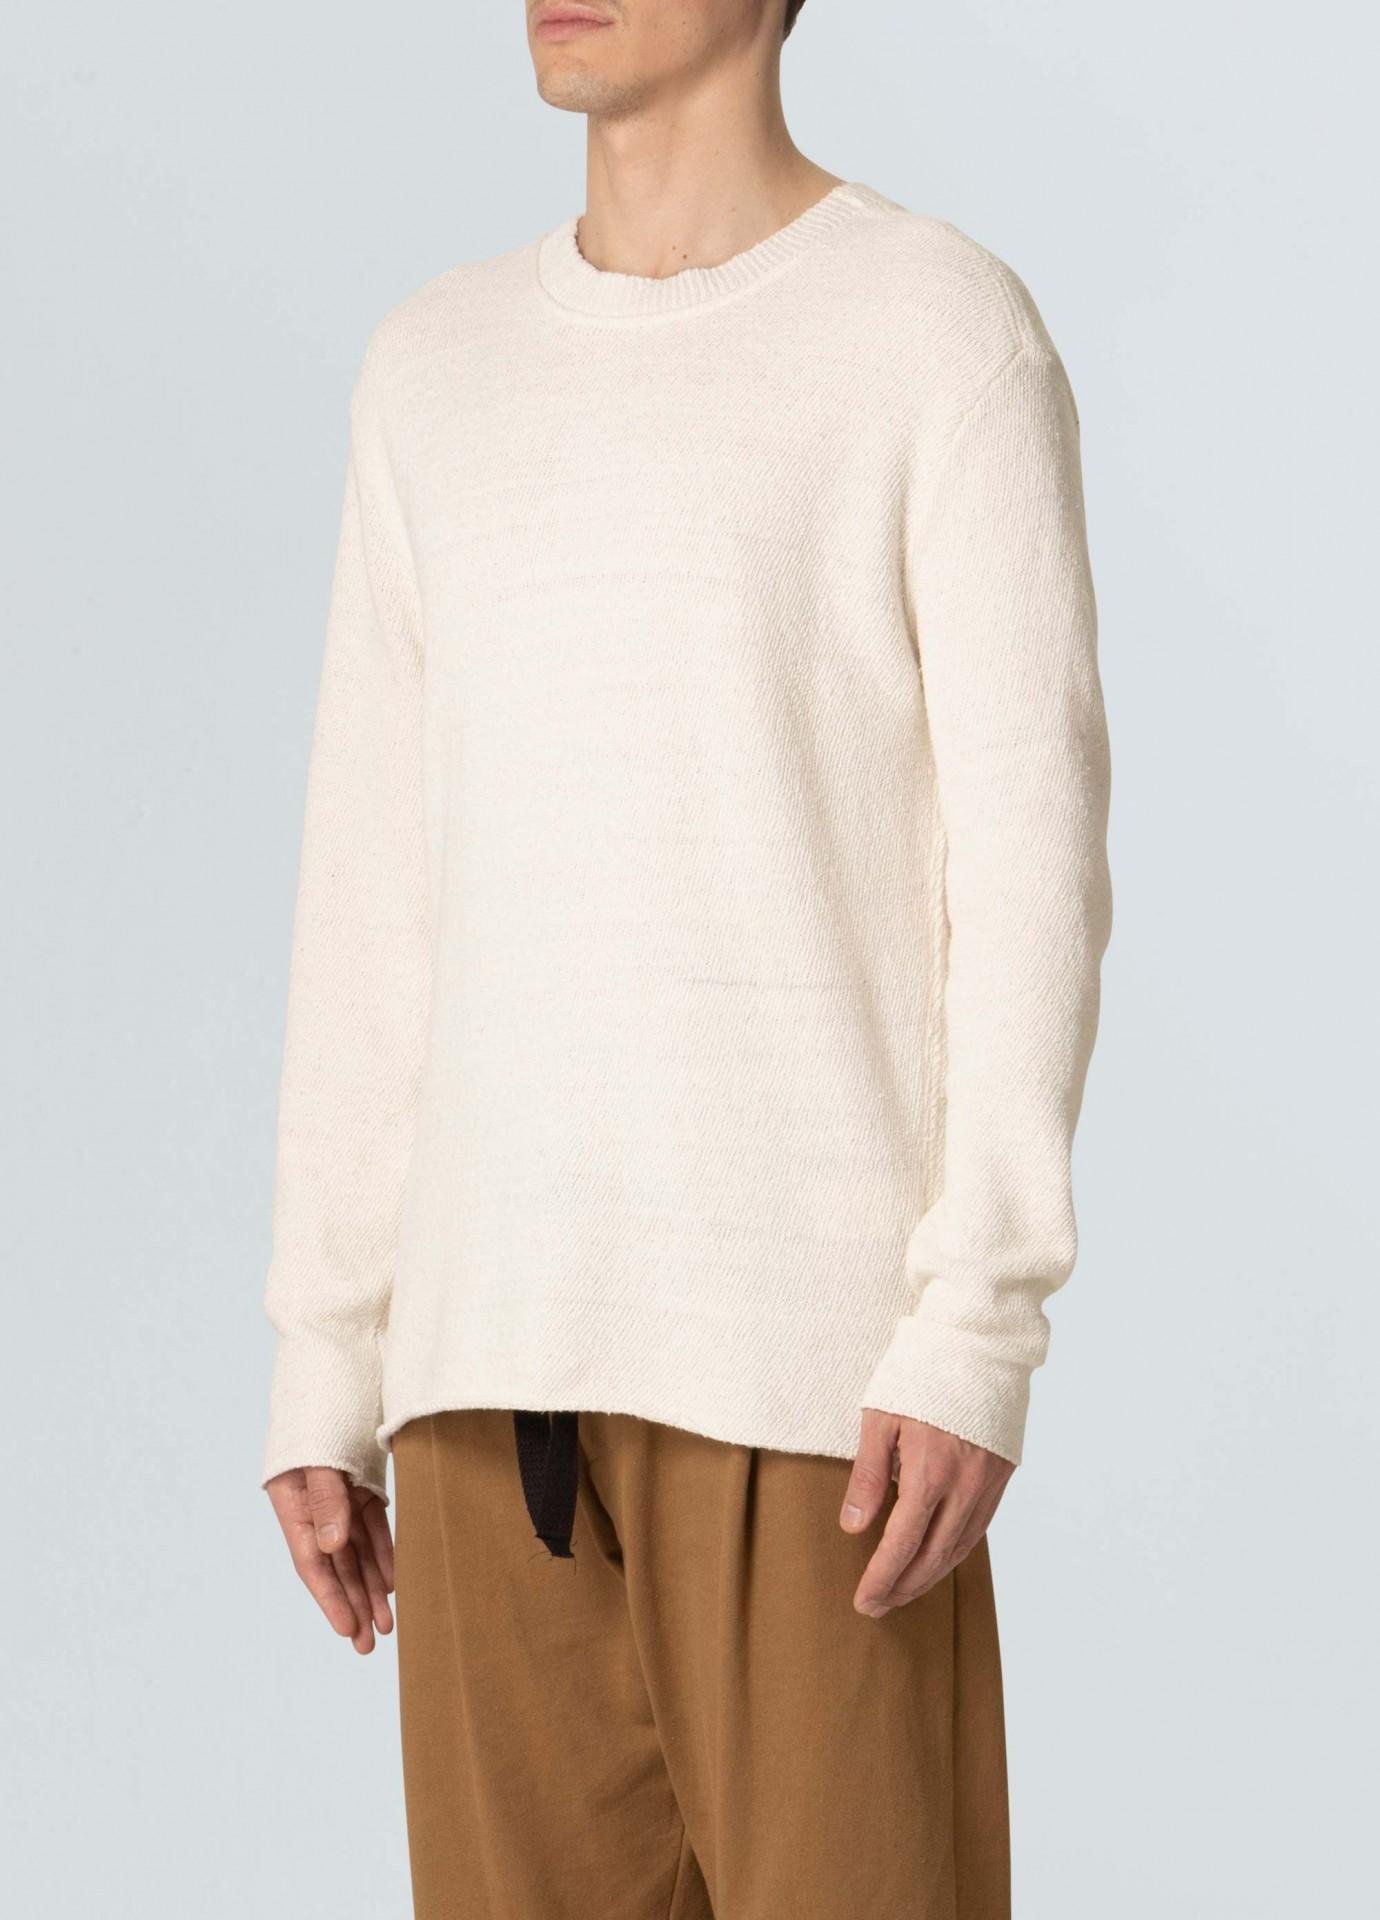 Sweater Masculino Osklen Tricot Fluid E-Fabrics